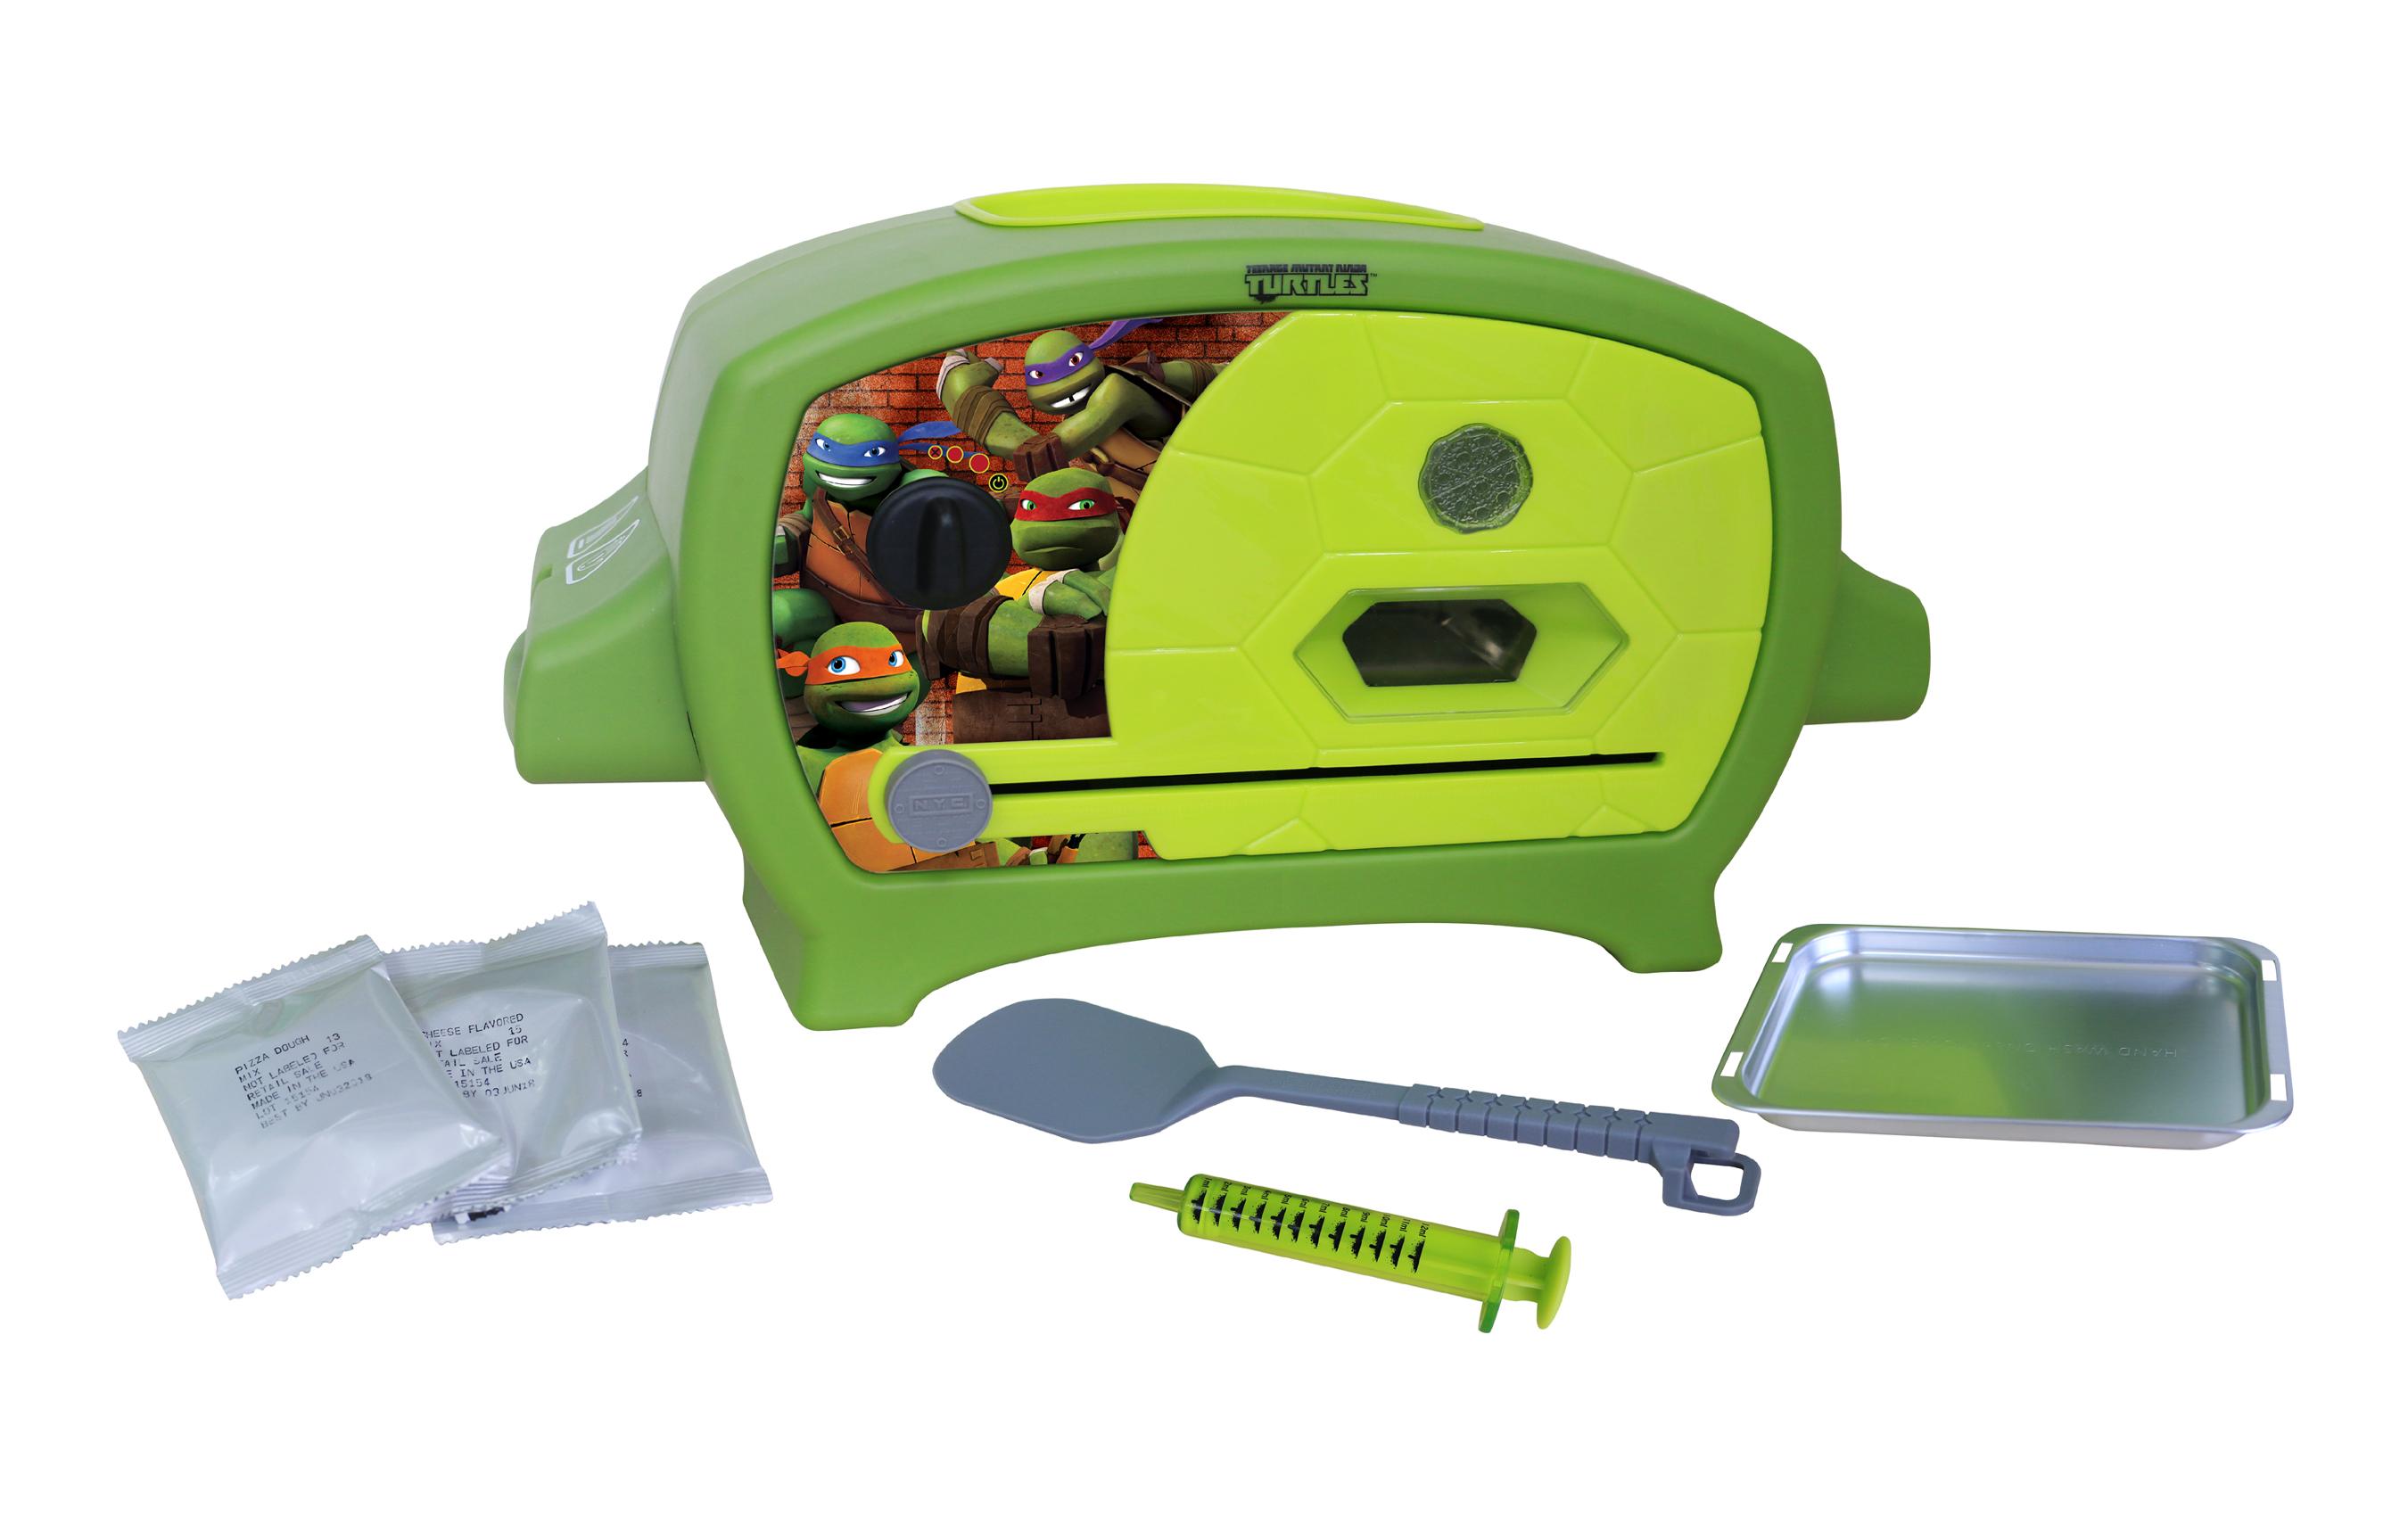 Teenage Mutant Ninja Turtles Pizza Oven 004W002880072001